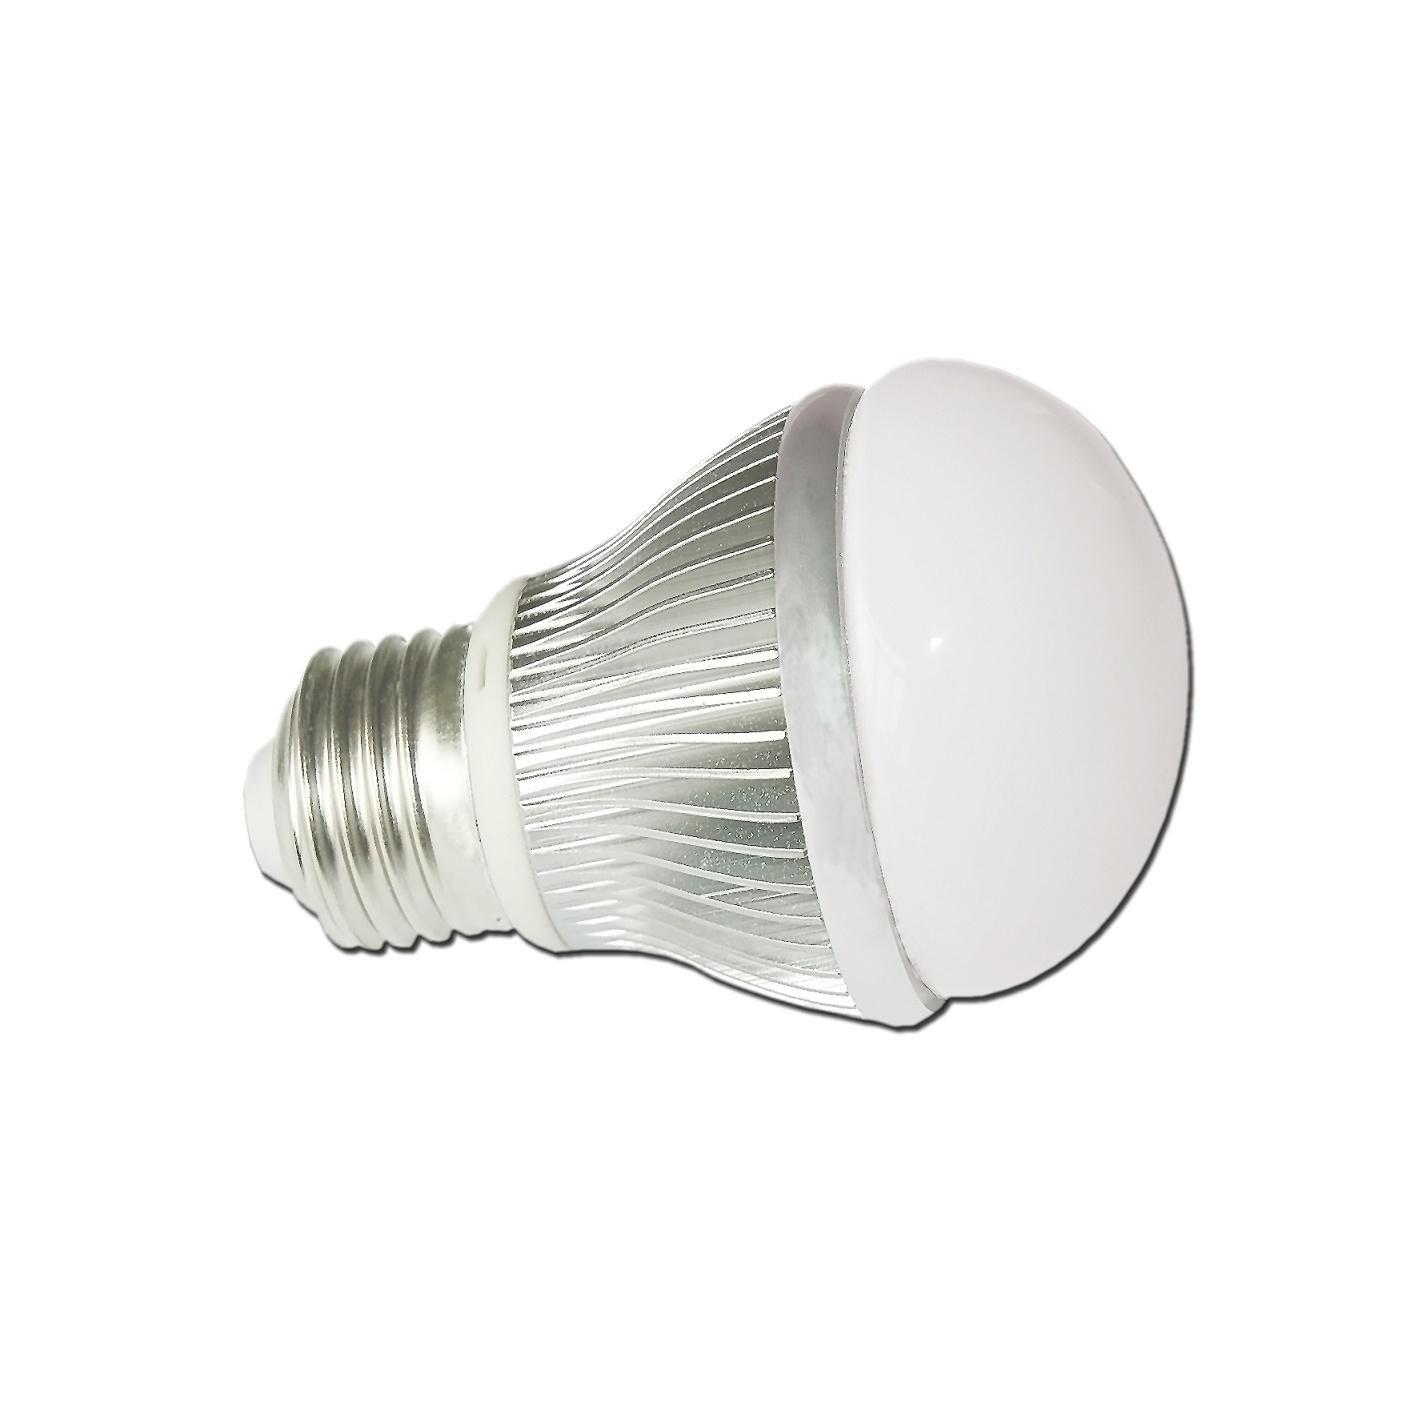 3w dimmable led bulb light mb e27 3w china led bulbs bulb led